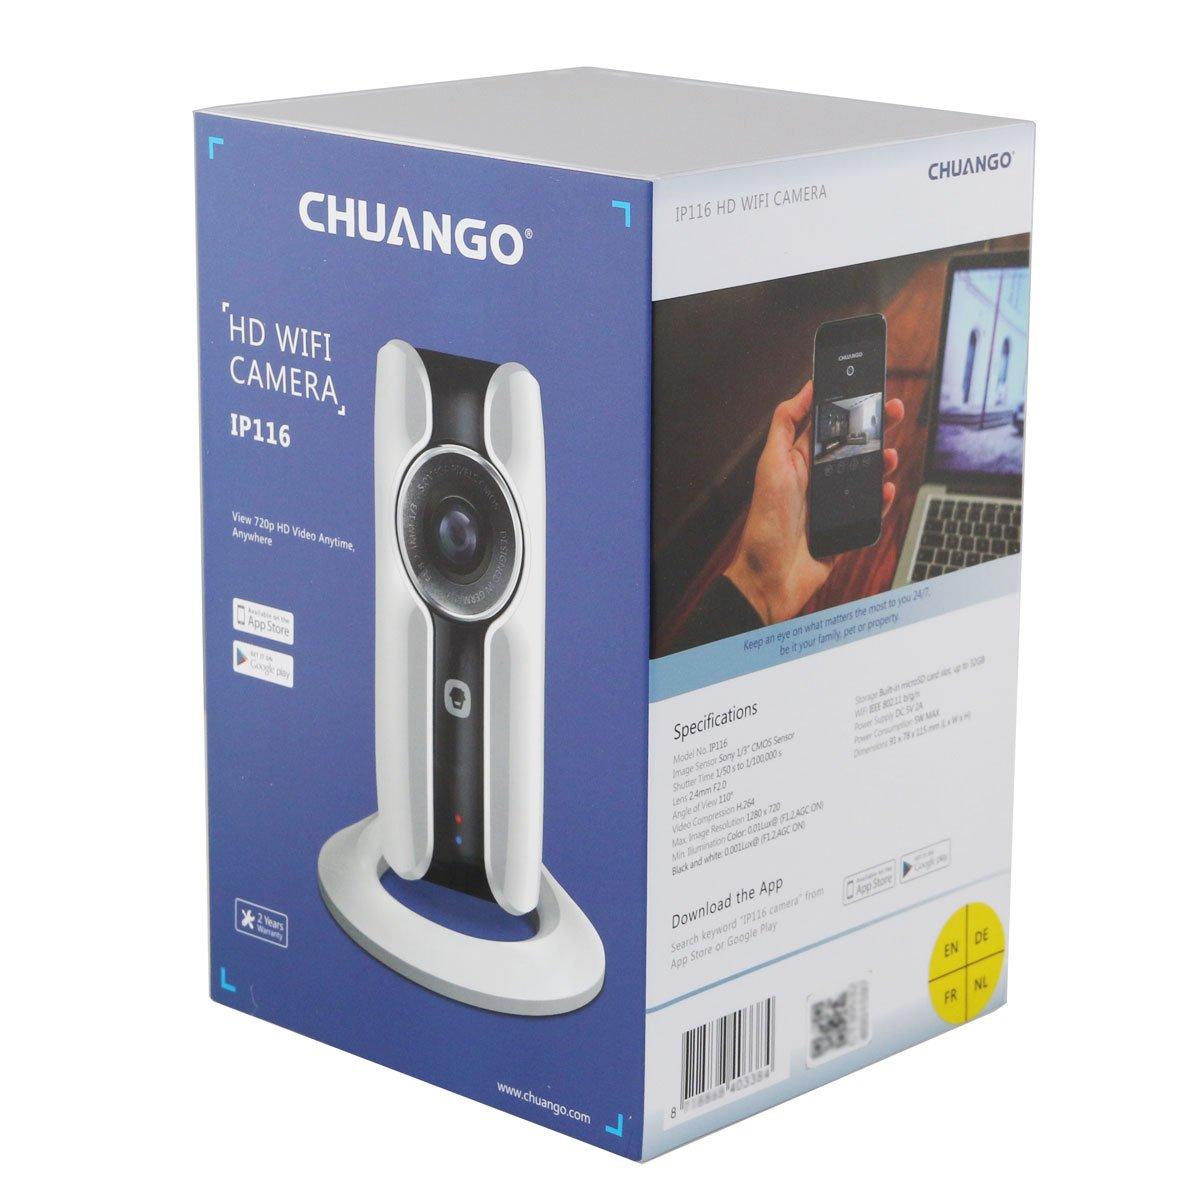 Chuango WiFi Cámara de red ip116 para sistemas de alarma G5 y o2